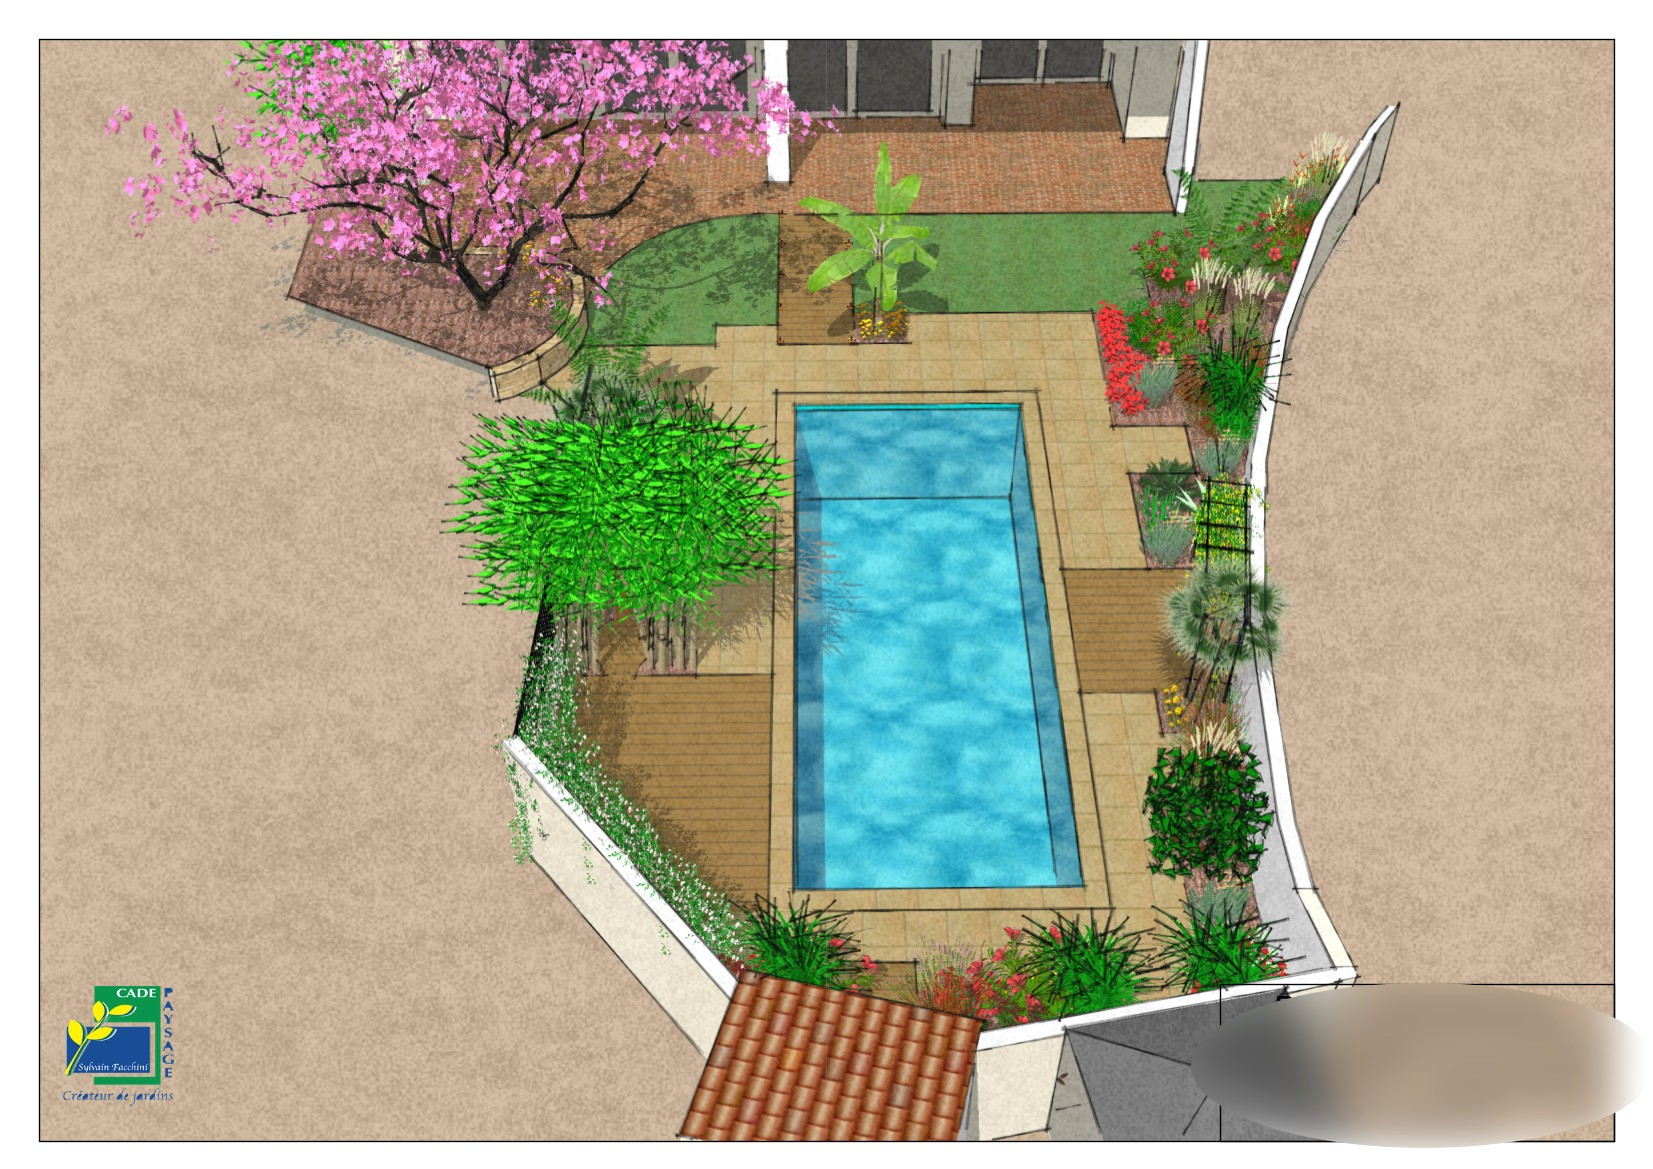 Plan De Jardin Gratuit Simulateur Aménagement Jardin